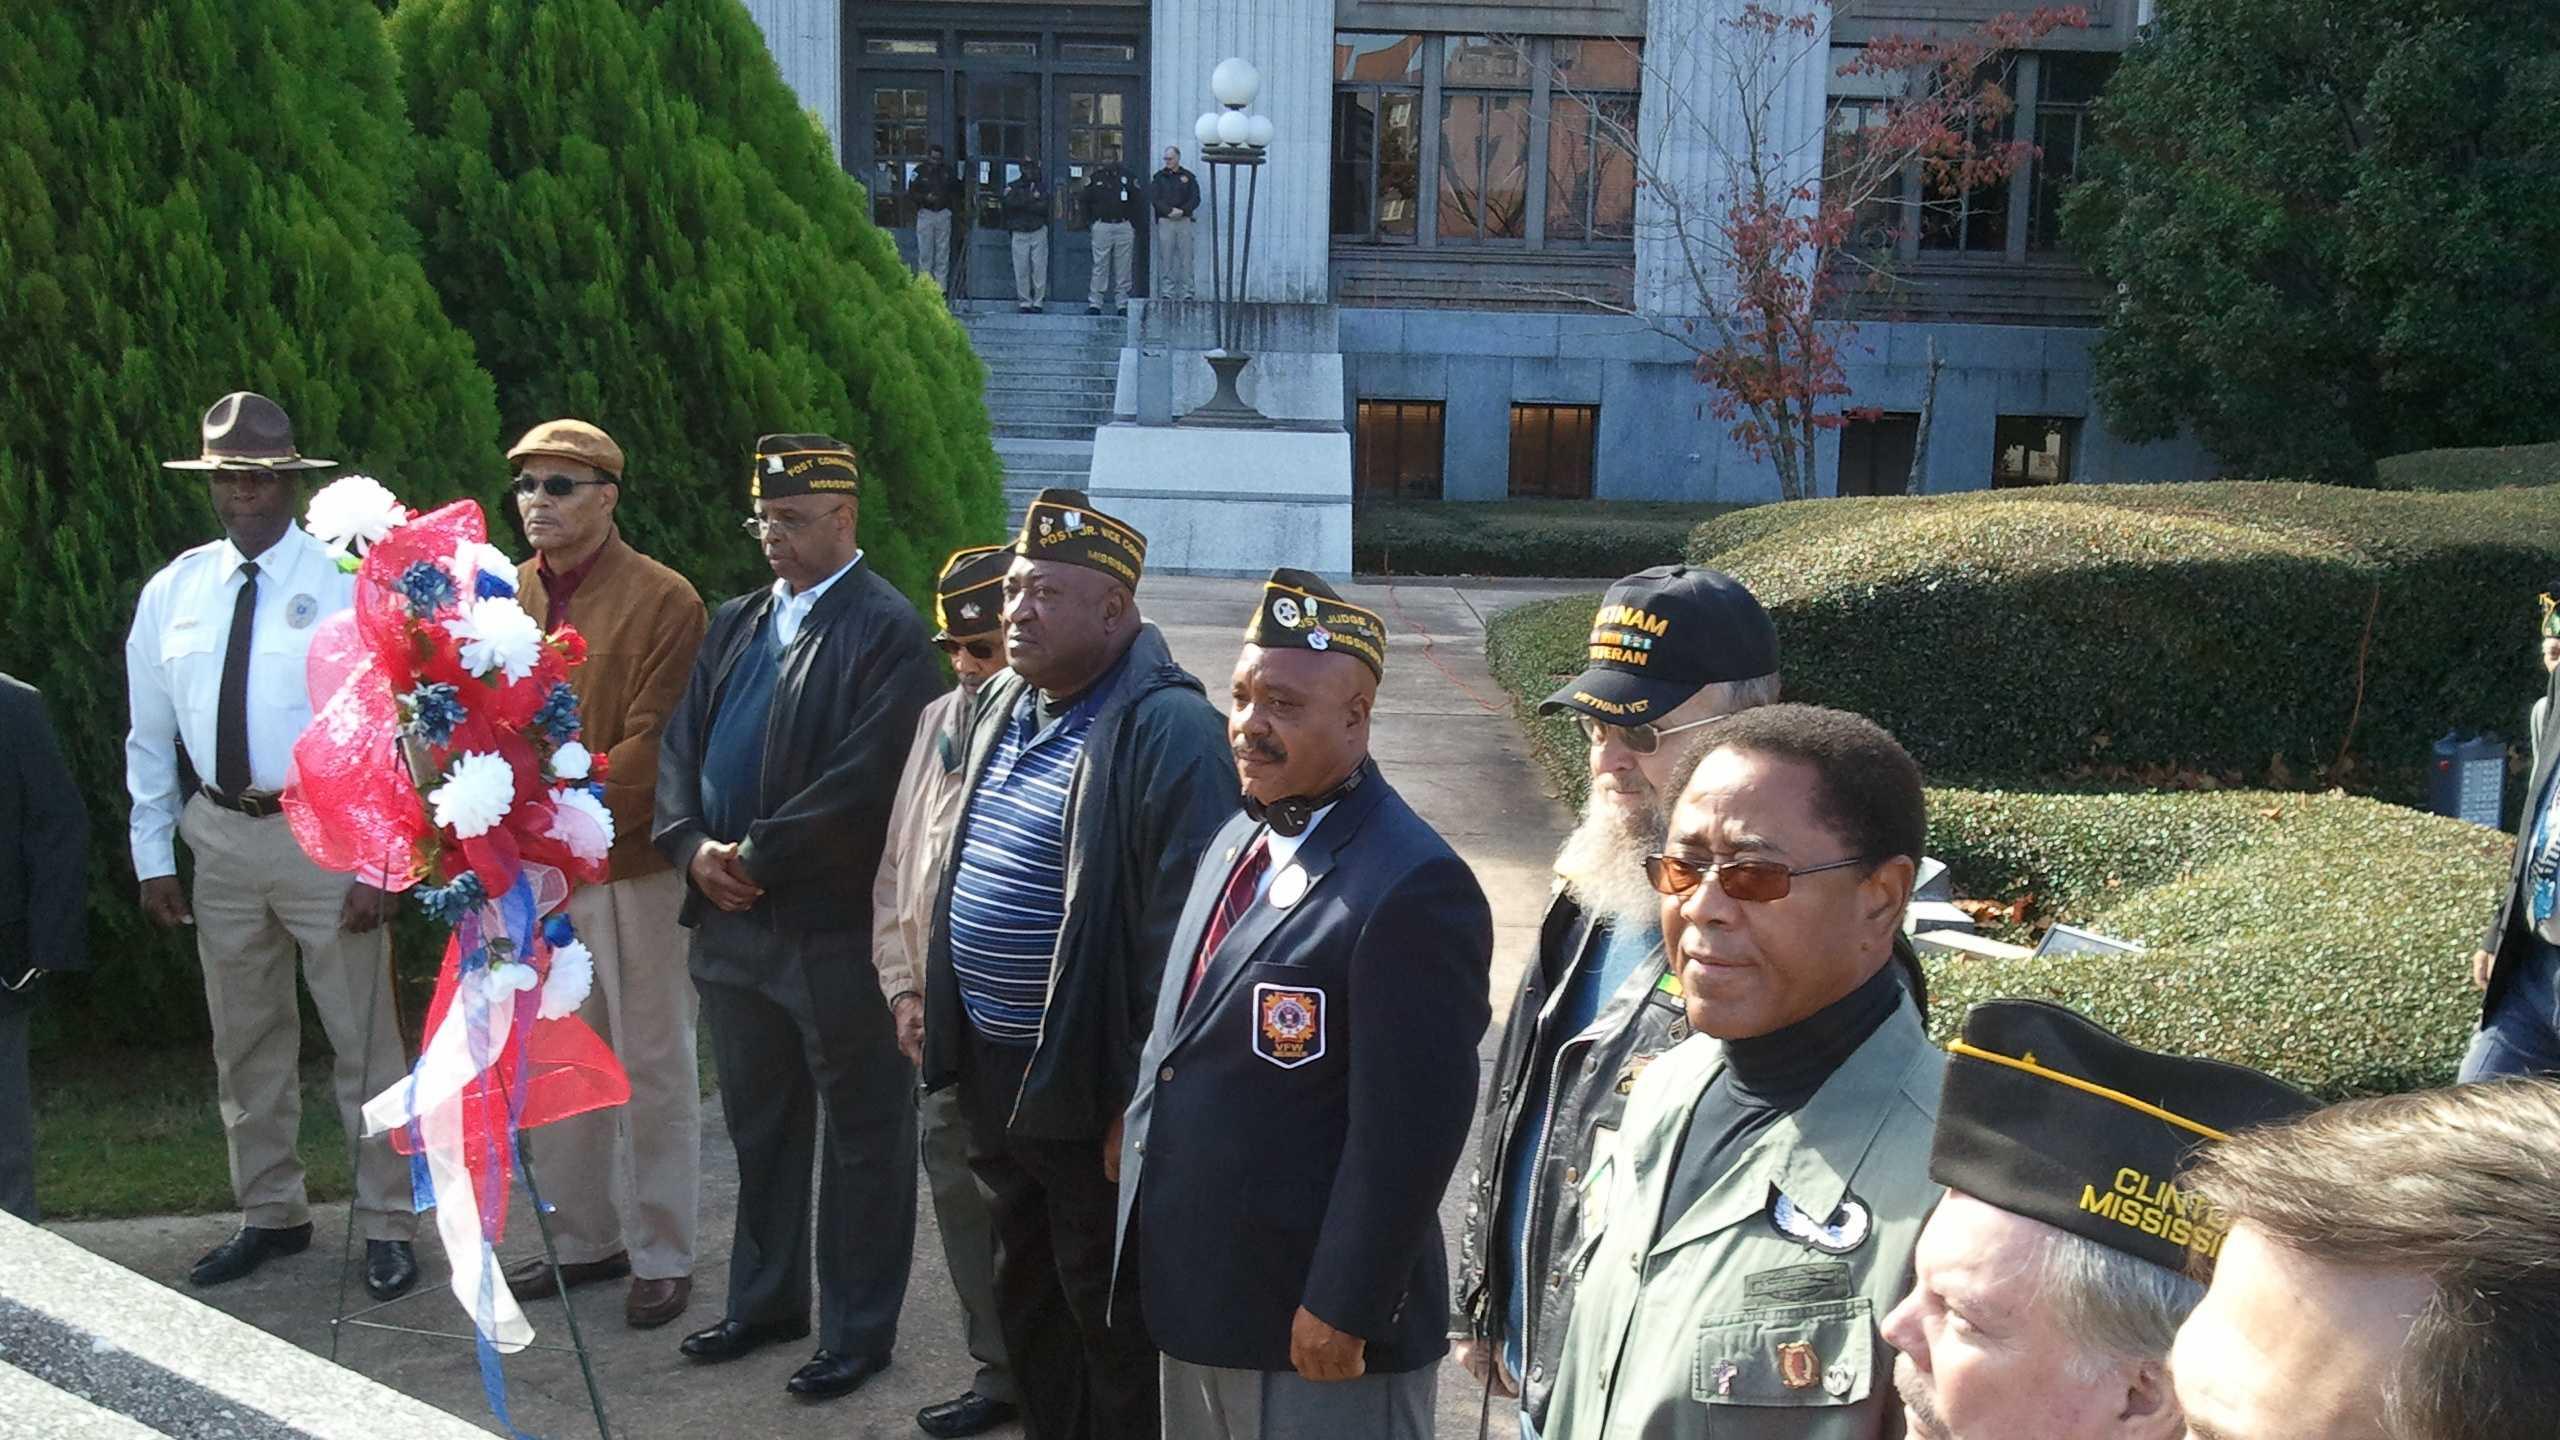 veterans around the monument 3.jpg